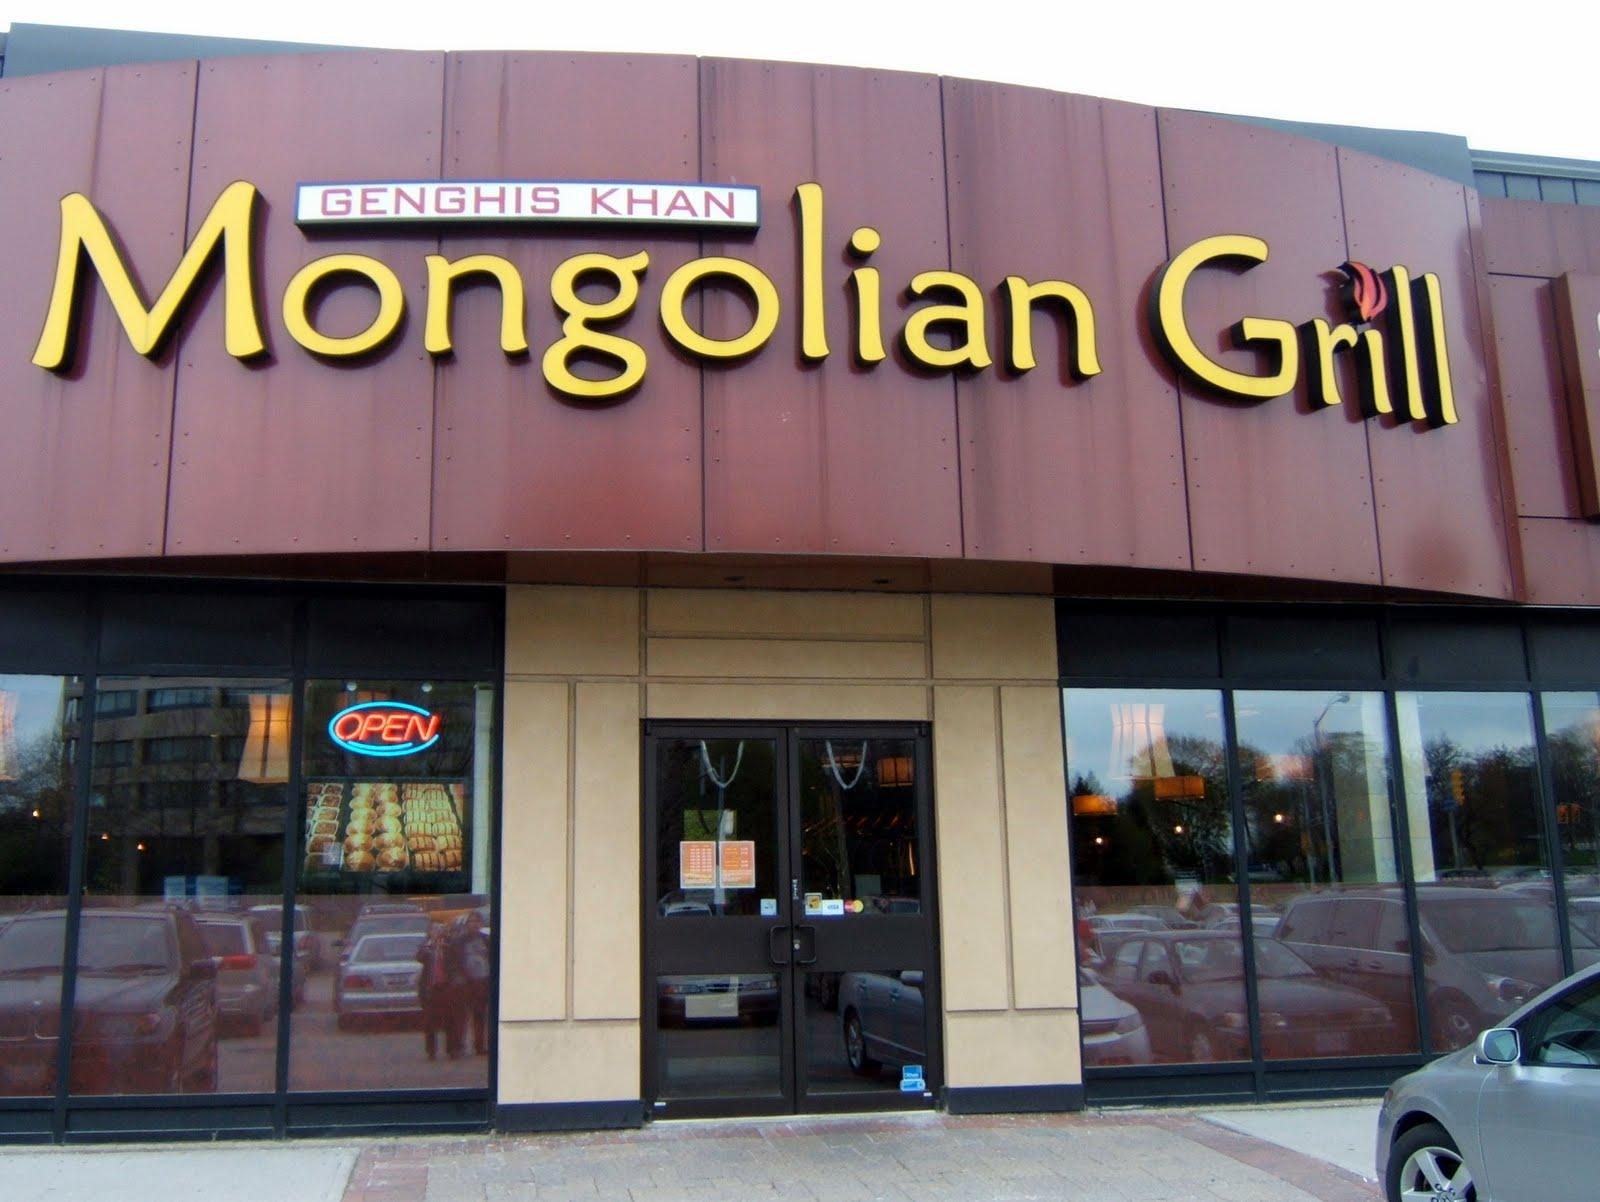 toronto ethnic eats challenge 64 mongolia genghis khan. Black Bedroom Furniture Sets. Home Design Ideas